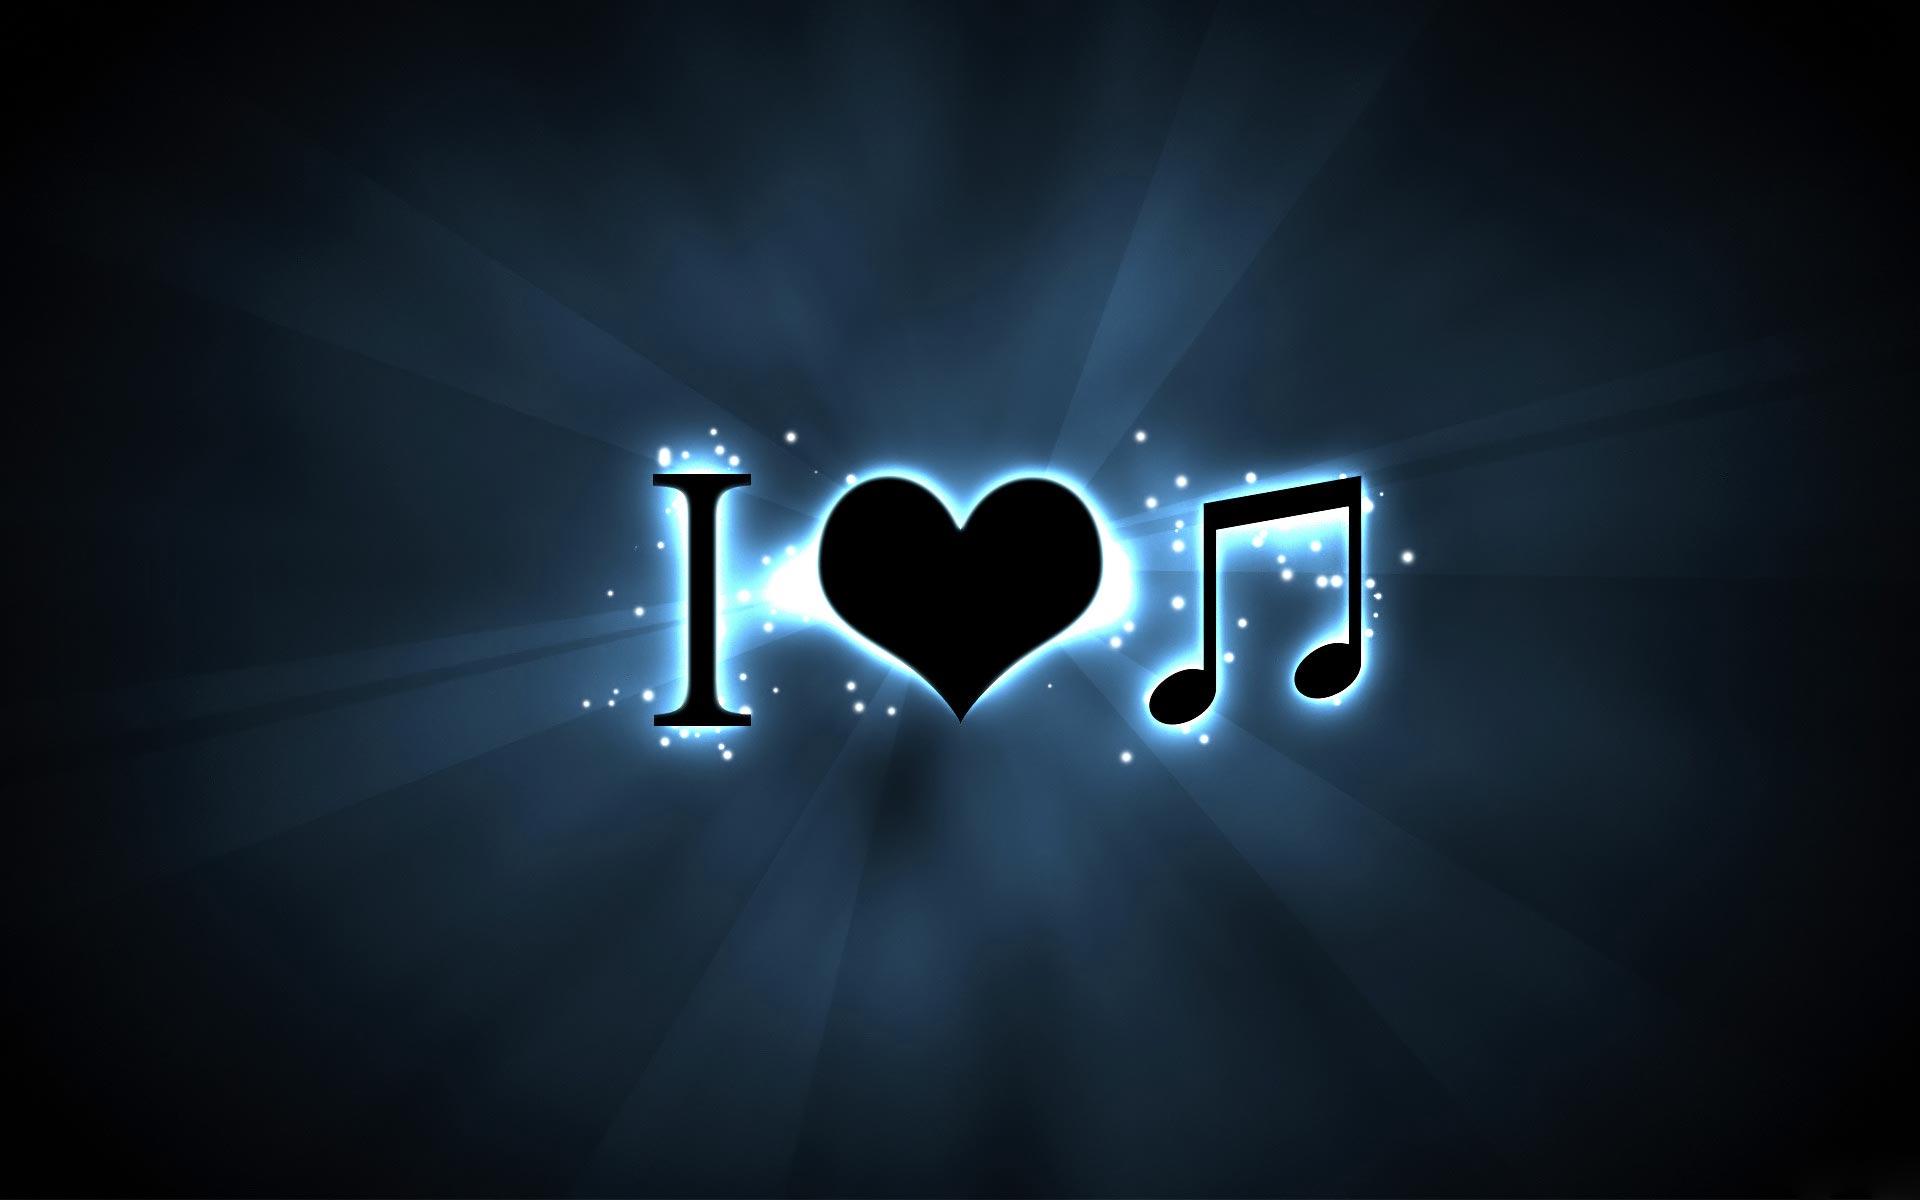 Awesome Music Wallpaper - WallpaperSafari